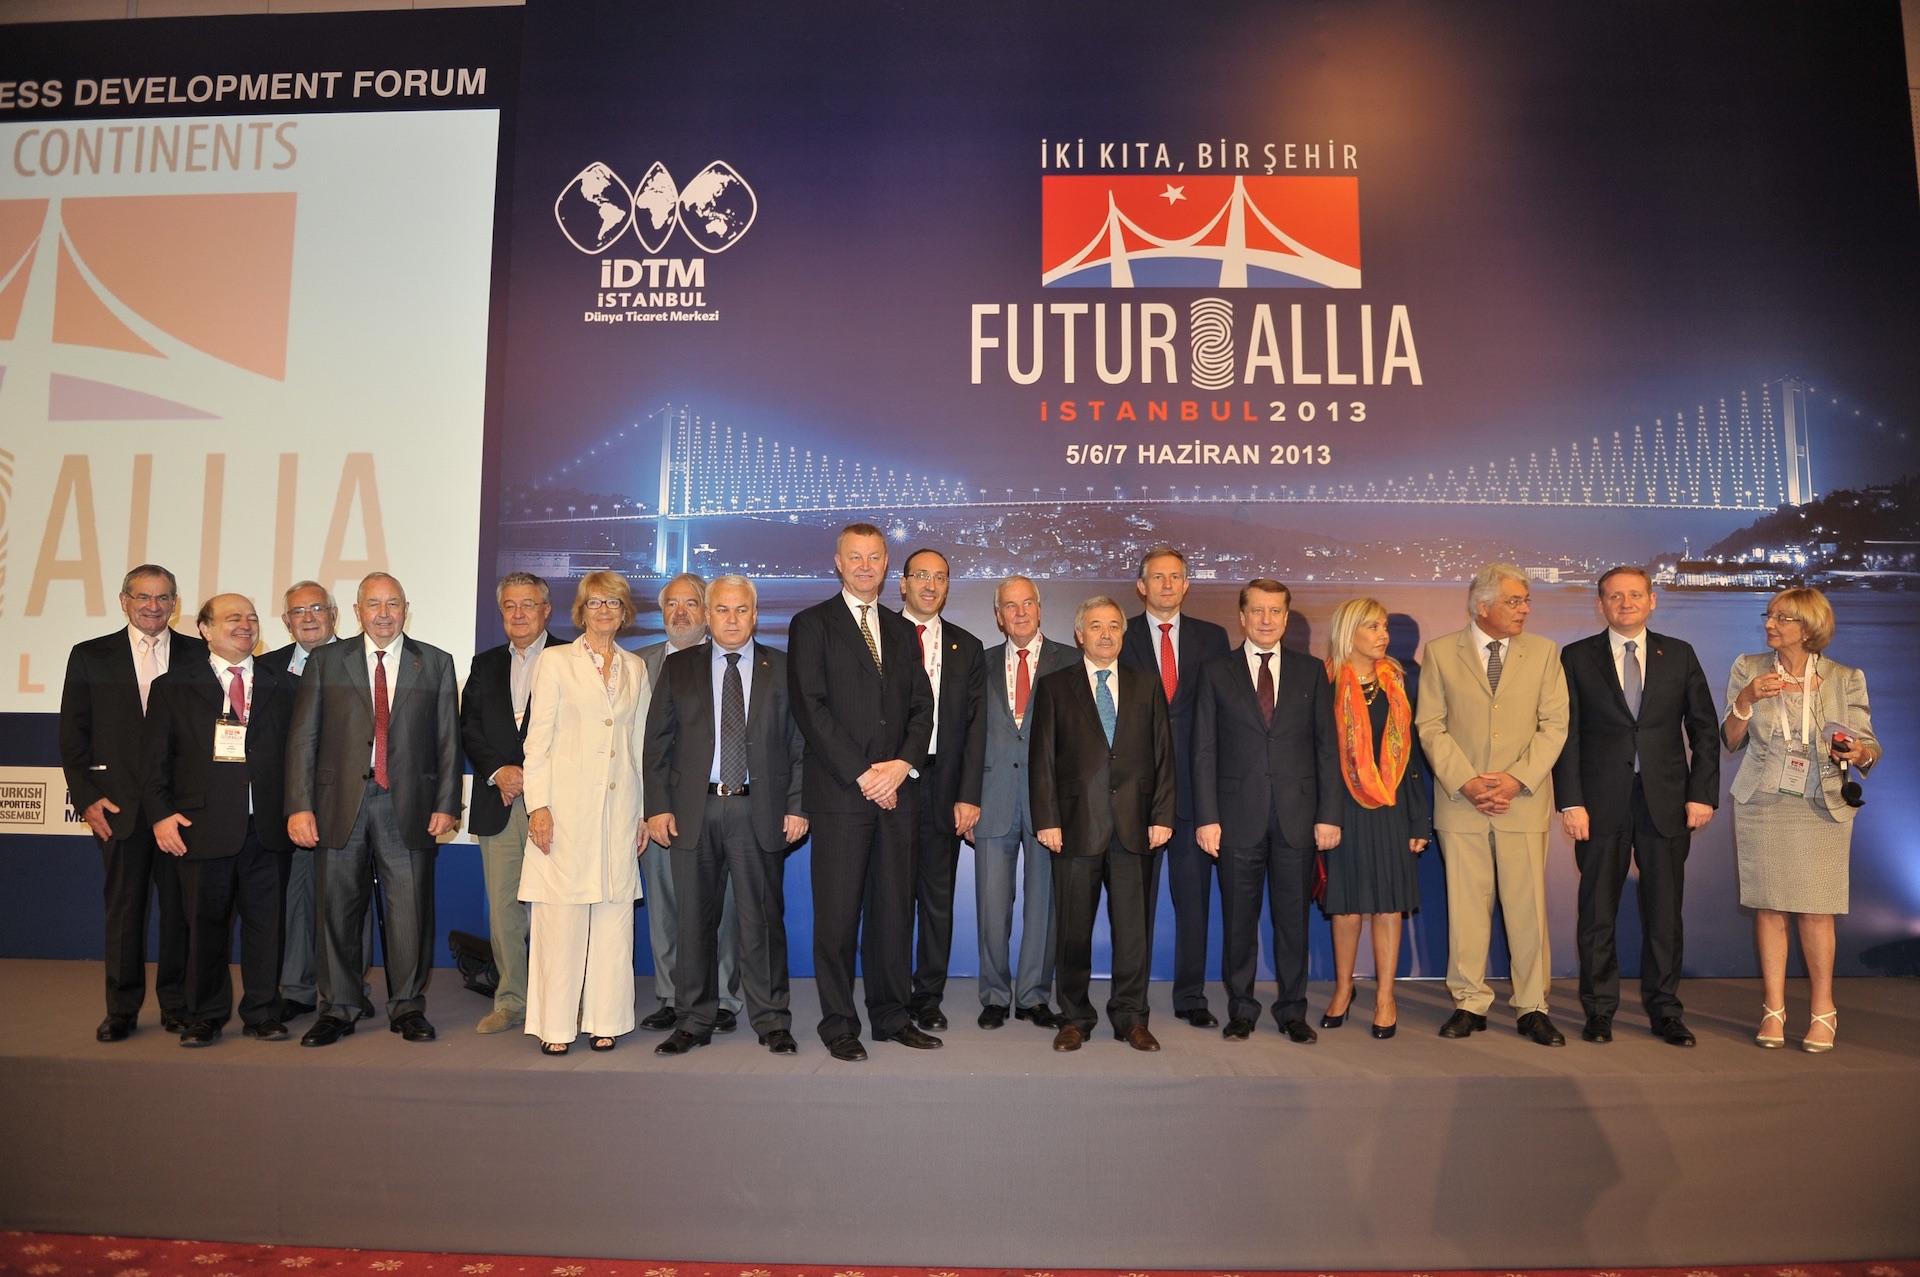 Futurallia Istanbul